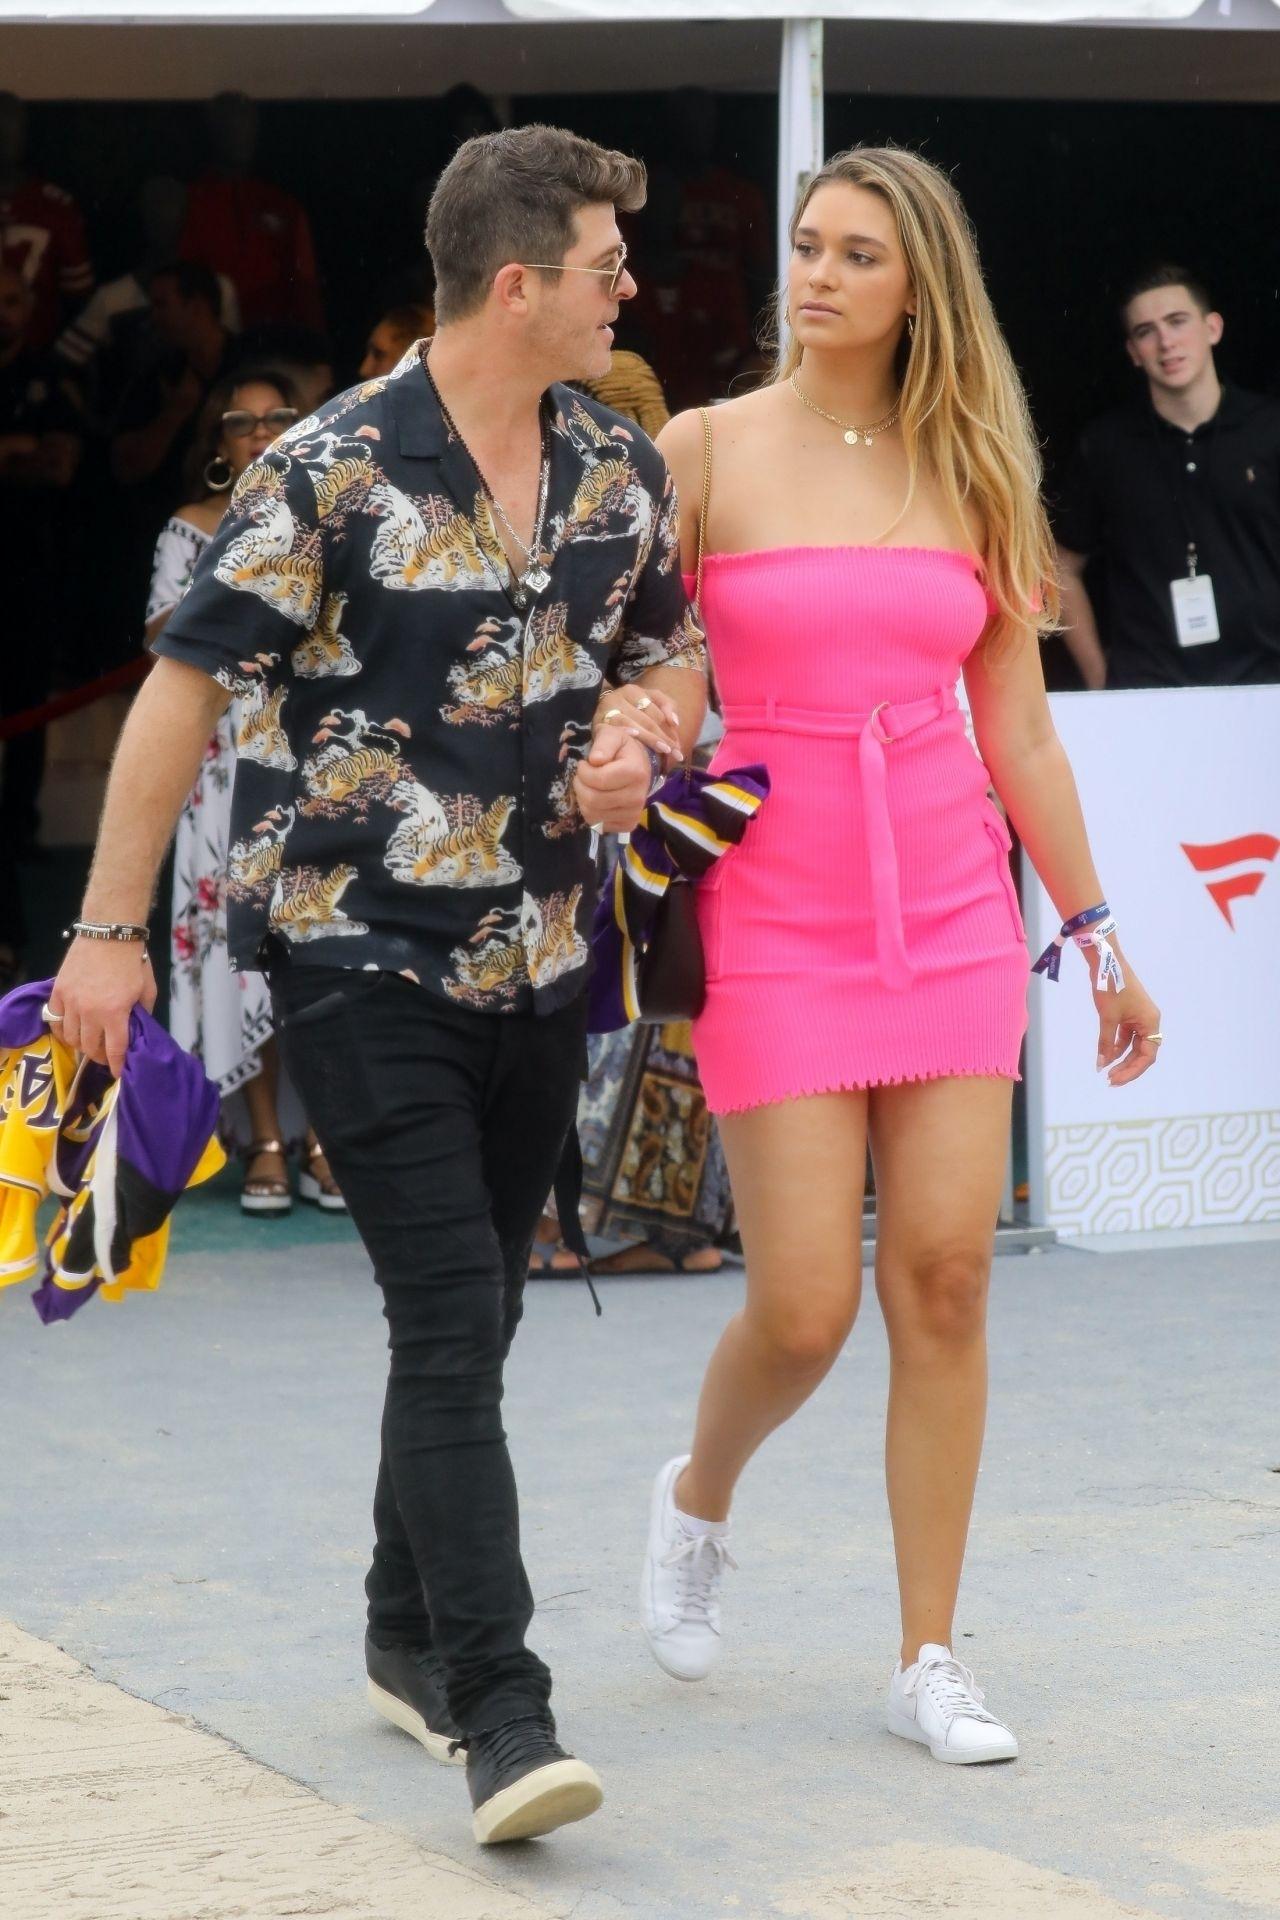 April Love Geary And Robin Thicke - Pre-Super Bowl Party In regarding Super Bowl Party Miami 2020